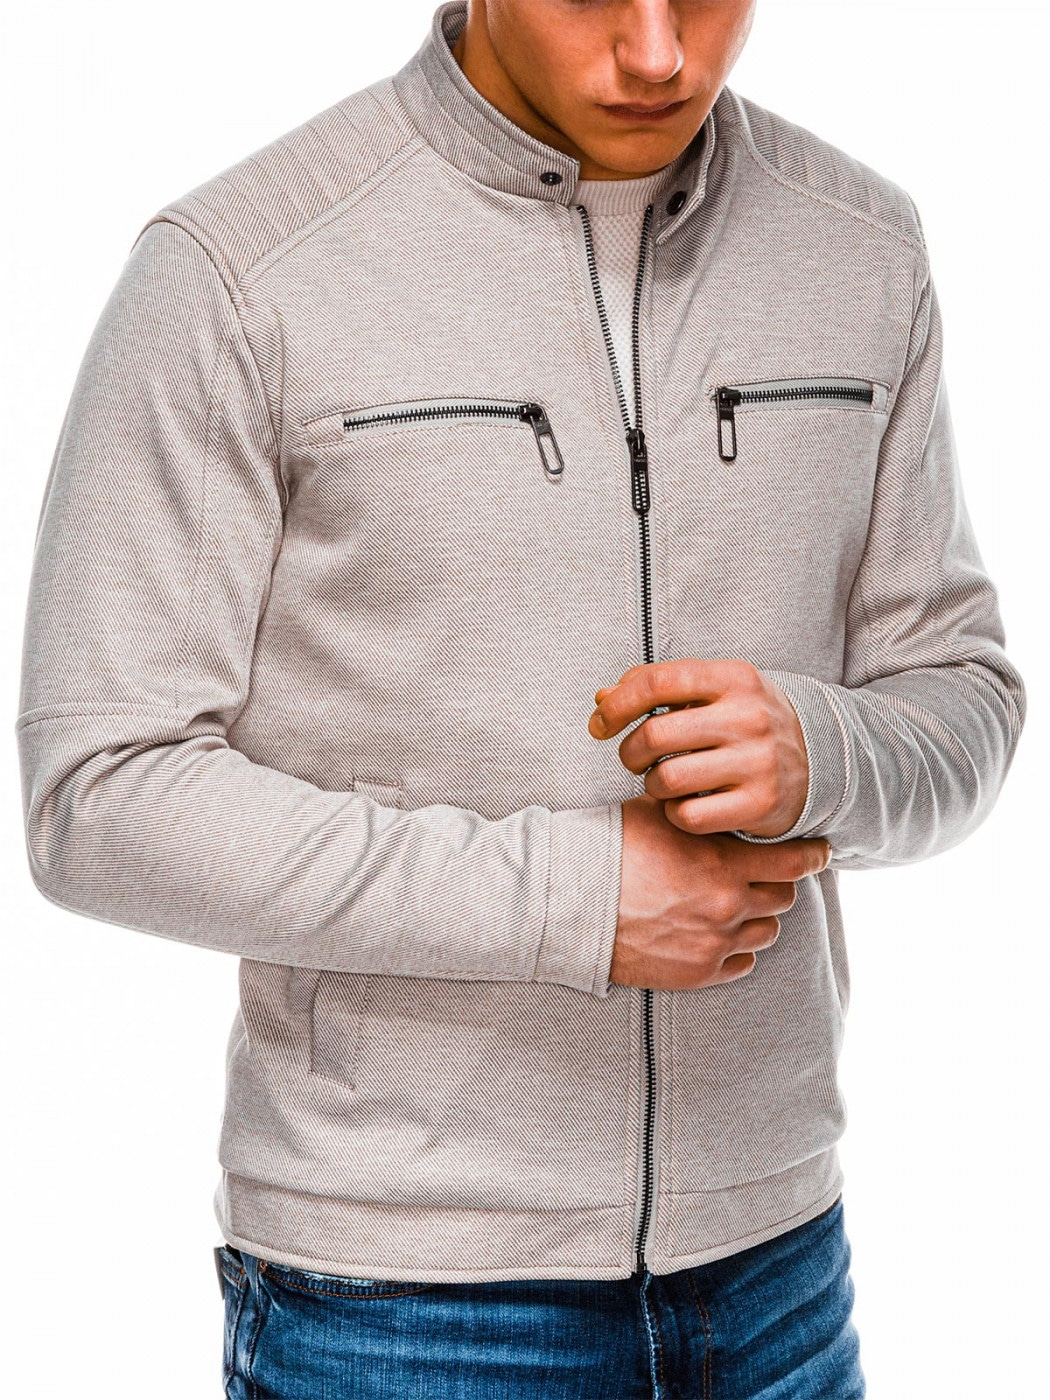 Men's jacket Ombre Mid-season